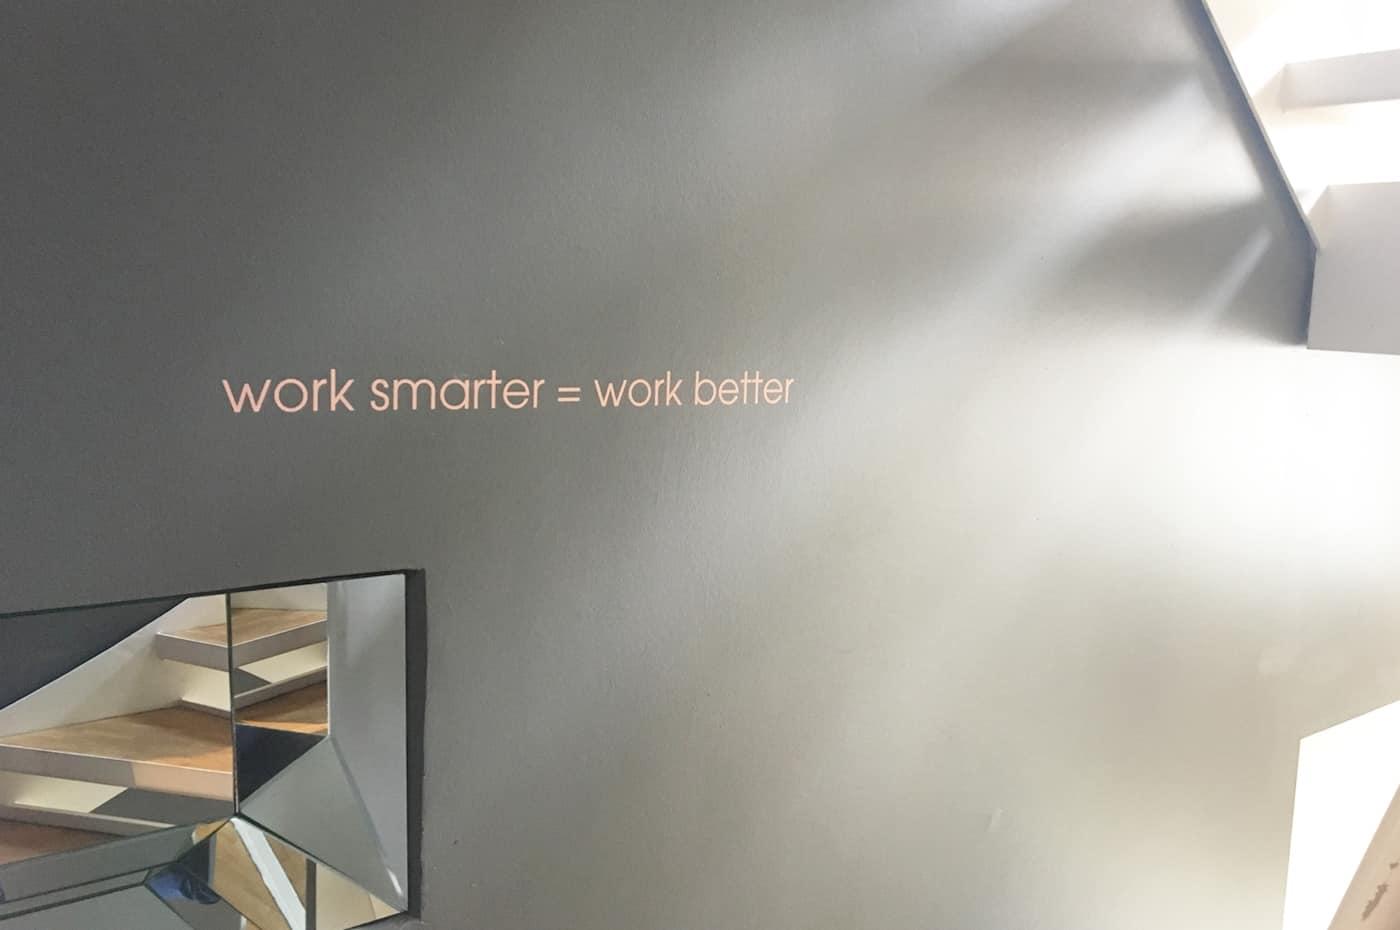 RITAarch, Arkitekter, Kontorhotel, Better, Vitra, København, indretning, wayfinding, grafik, kontorfællesskab, kontorindretning, erhvervsindretning, indretning